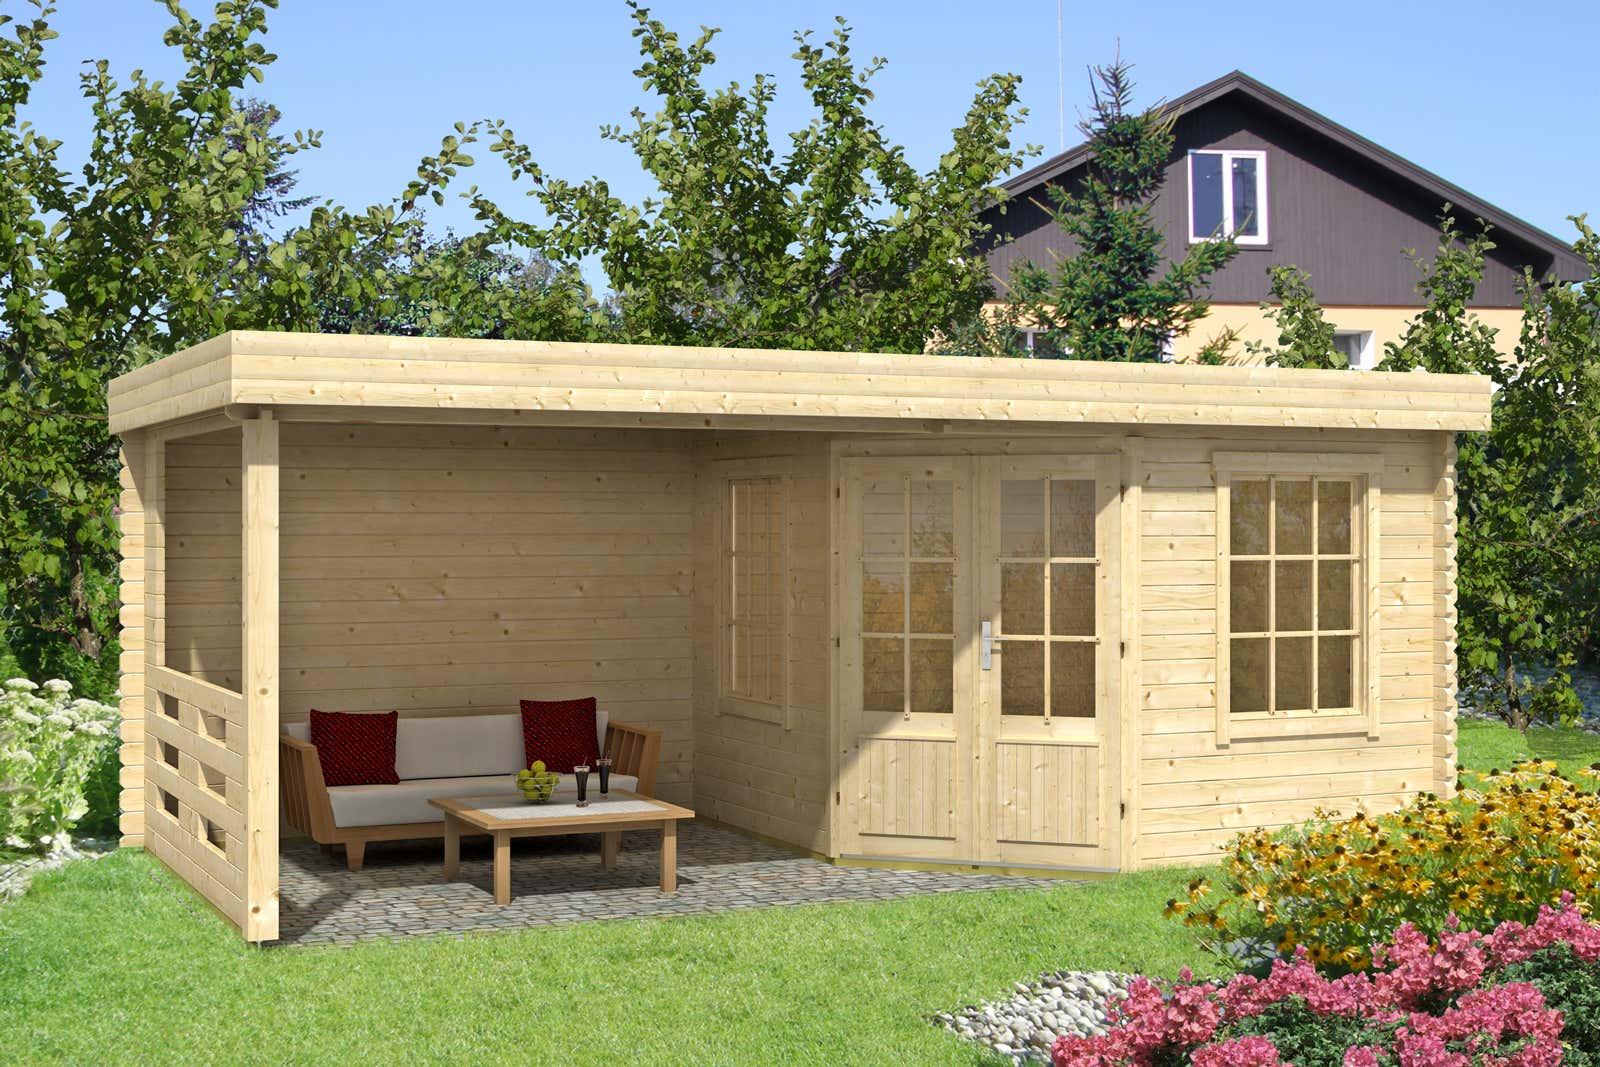 gartenhaus modell hanna 40 gartenhaus modell hanna 40 a z gartenhaus gmbh. Black Bedroom Furniture Sets. Home Design Ideas